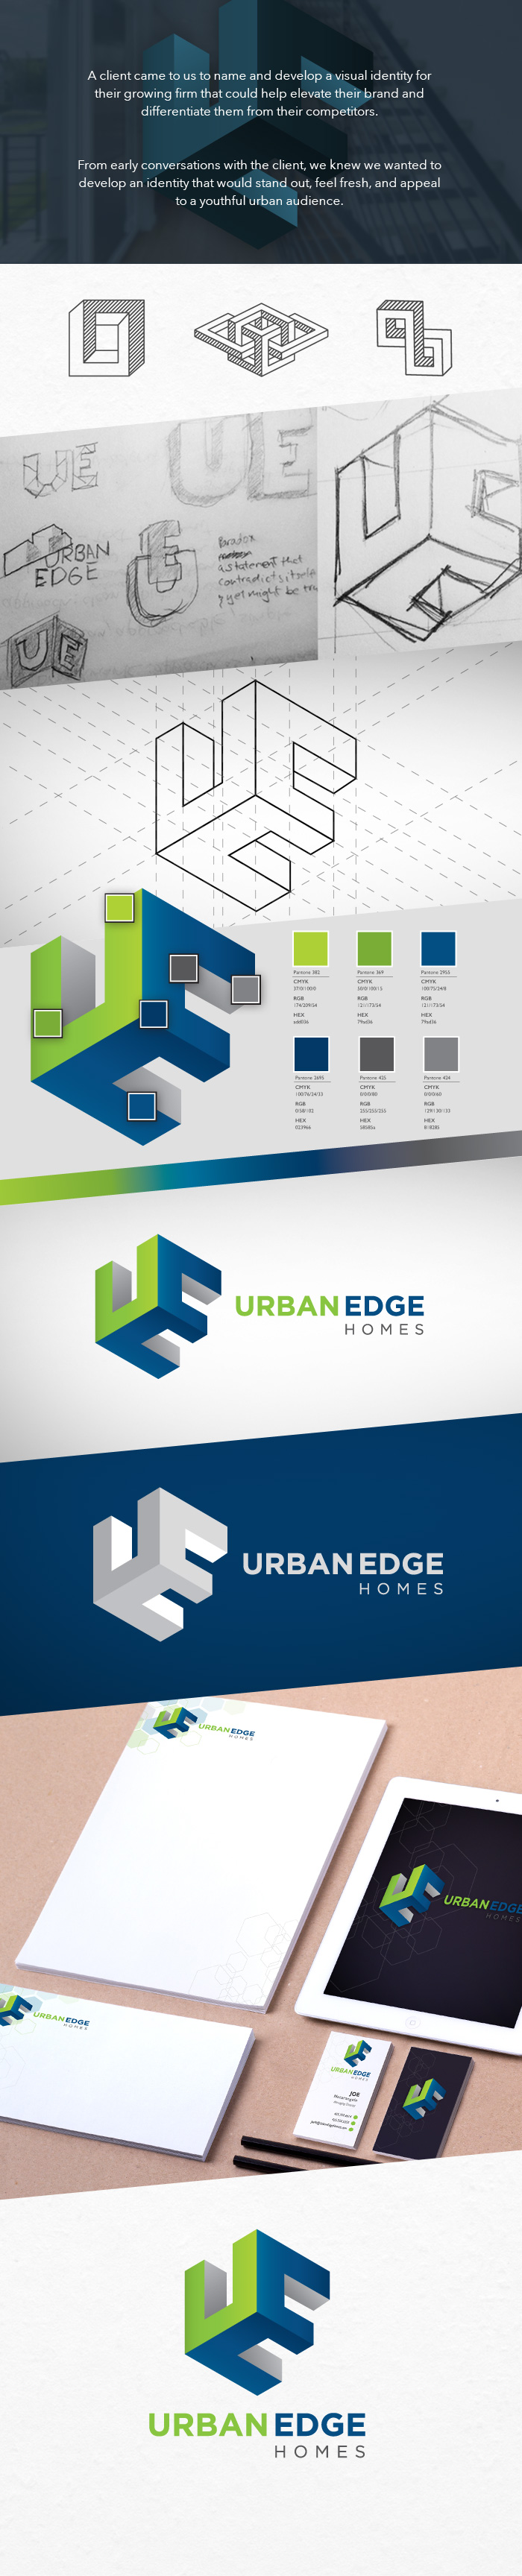 UE-logo-creation-LG